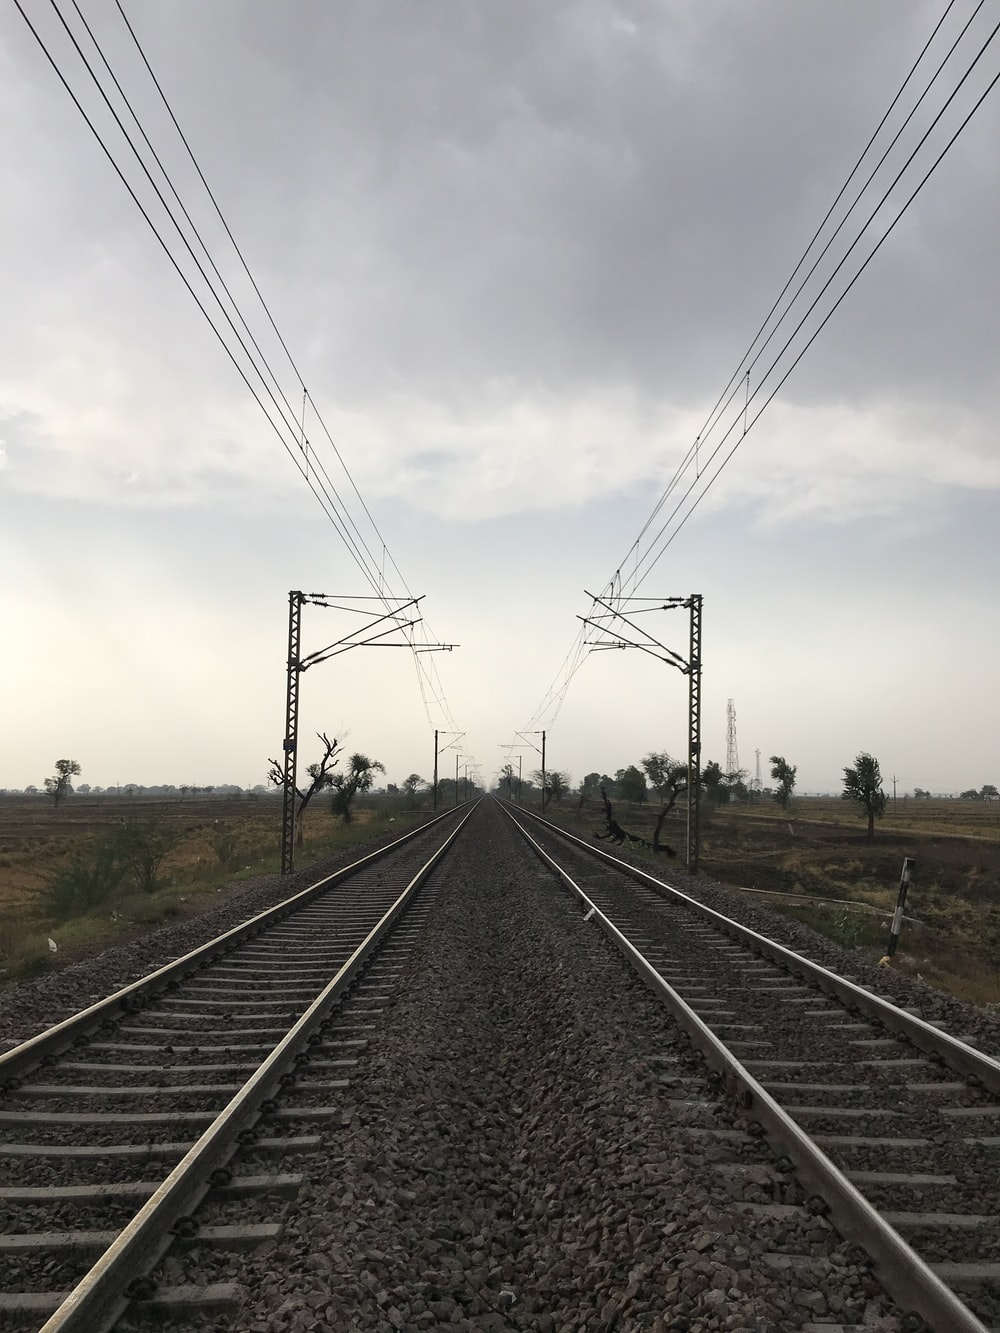 black metal train rail under white clouds during daytime